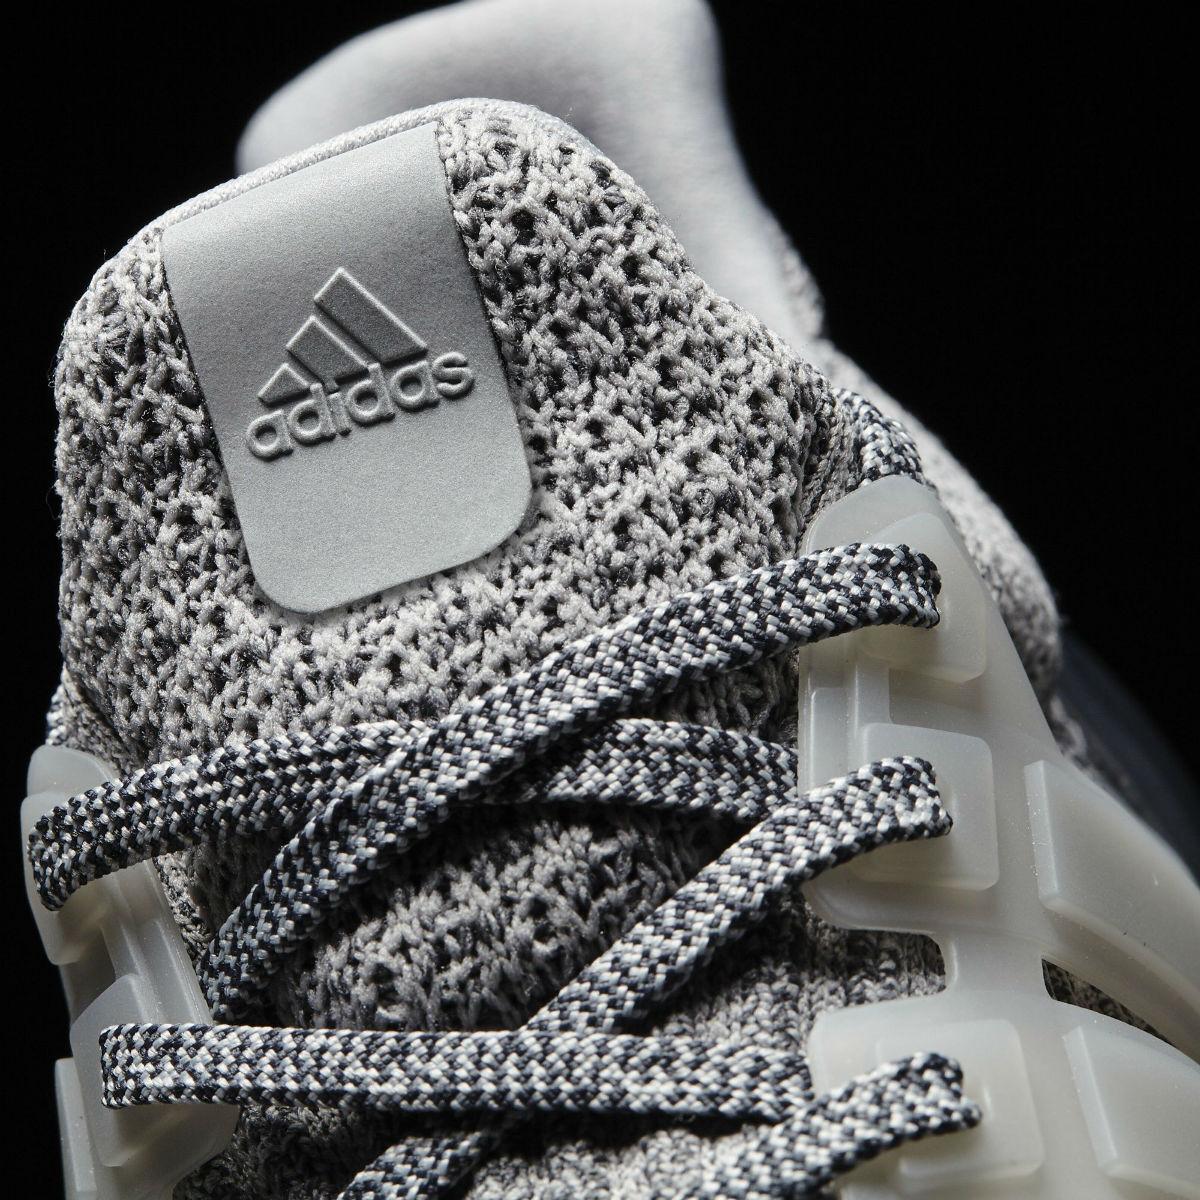 Adidas - schub ba8143.graue 3.0 silber packungsgröße 7.super bowl ltd. ba8143.graue schub nmd - db0664